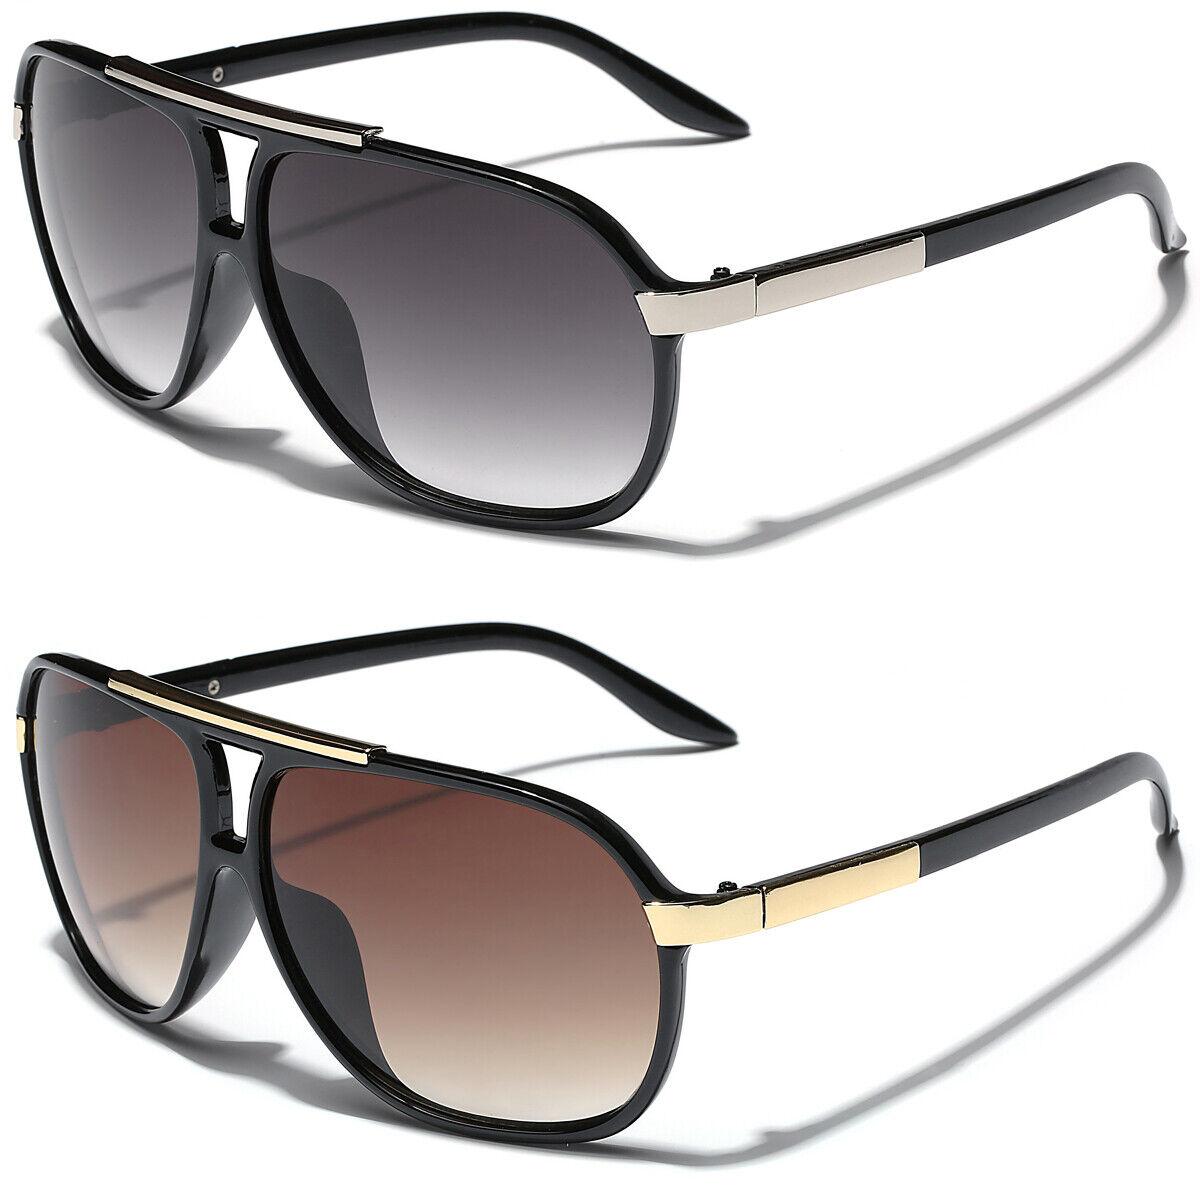 Retro 80s Fashion Aviator Sunglasses Black White Brown Men W